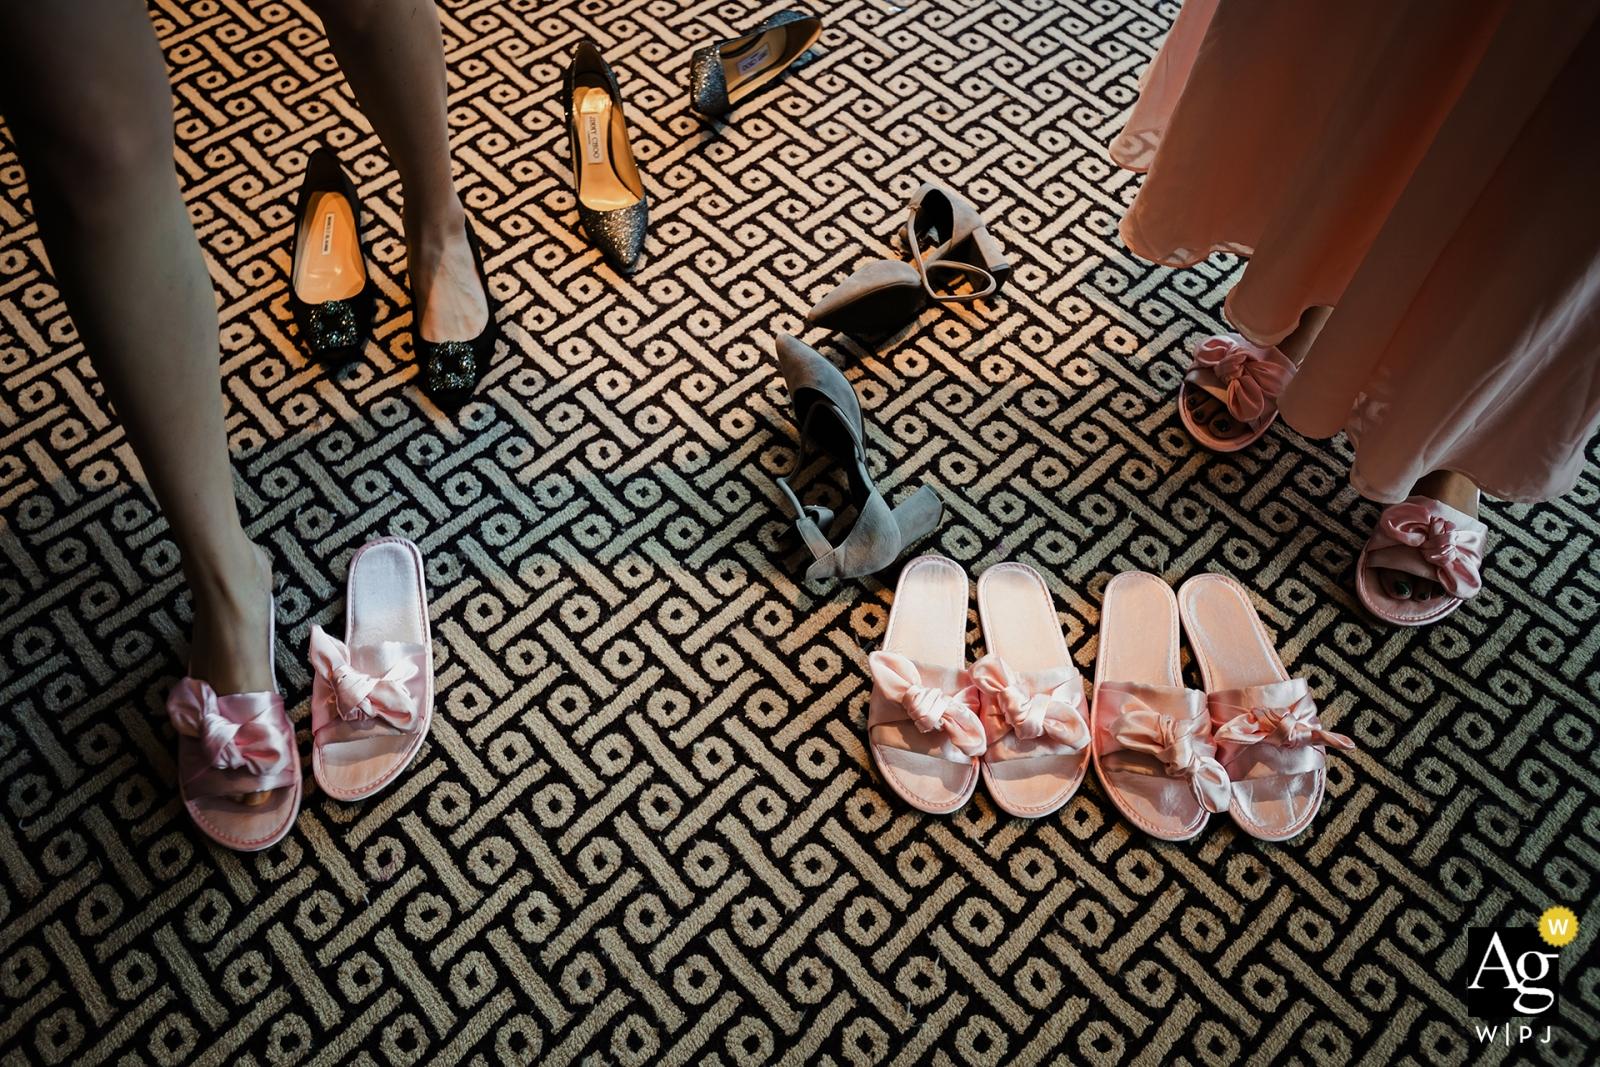 Xiang Liu is an artistic wedding photographer for